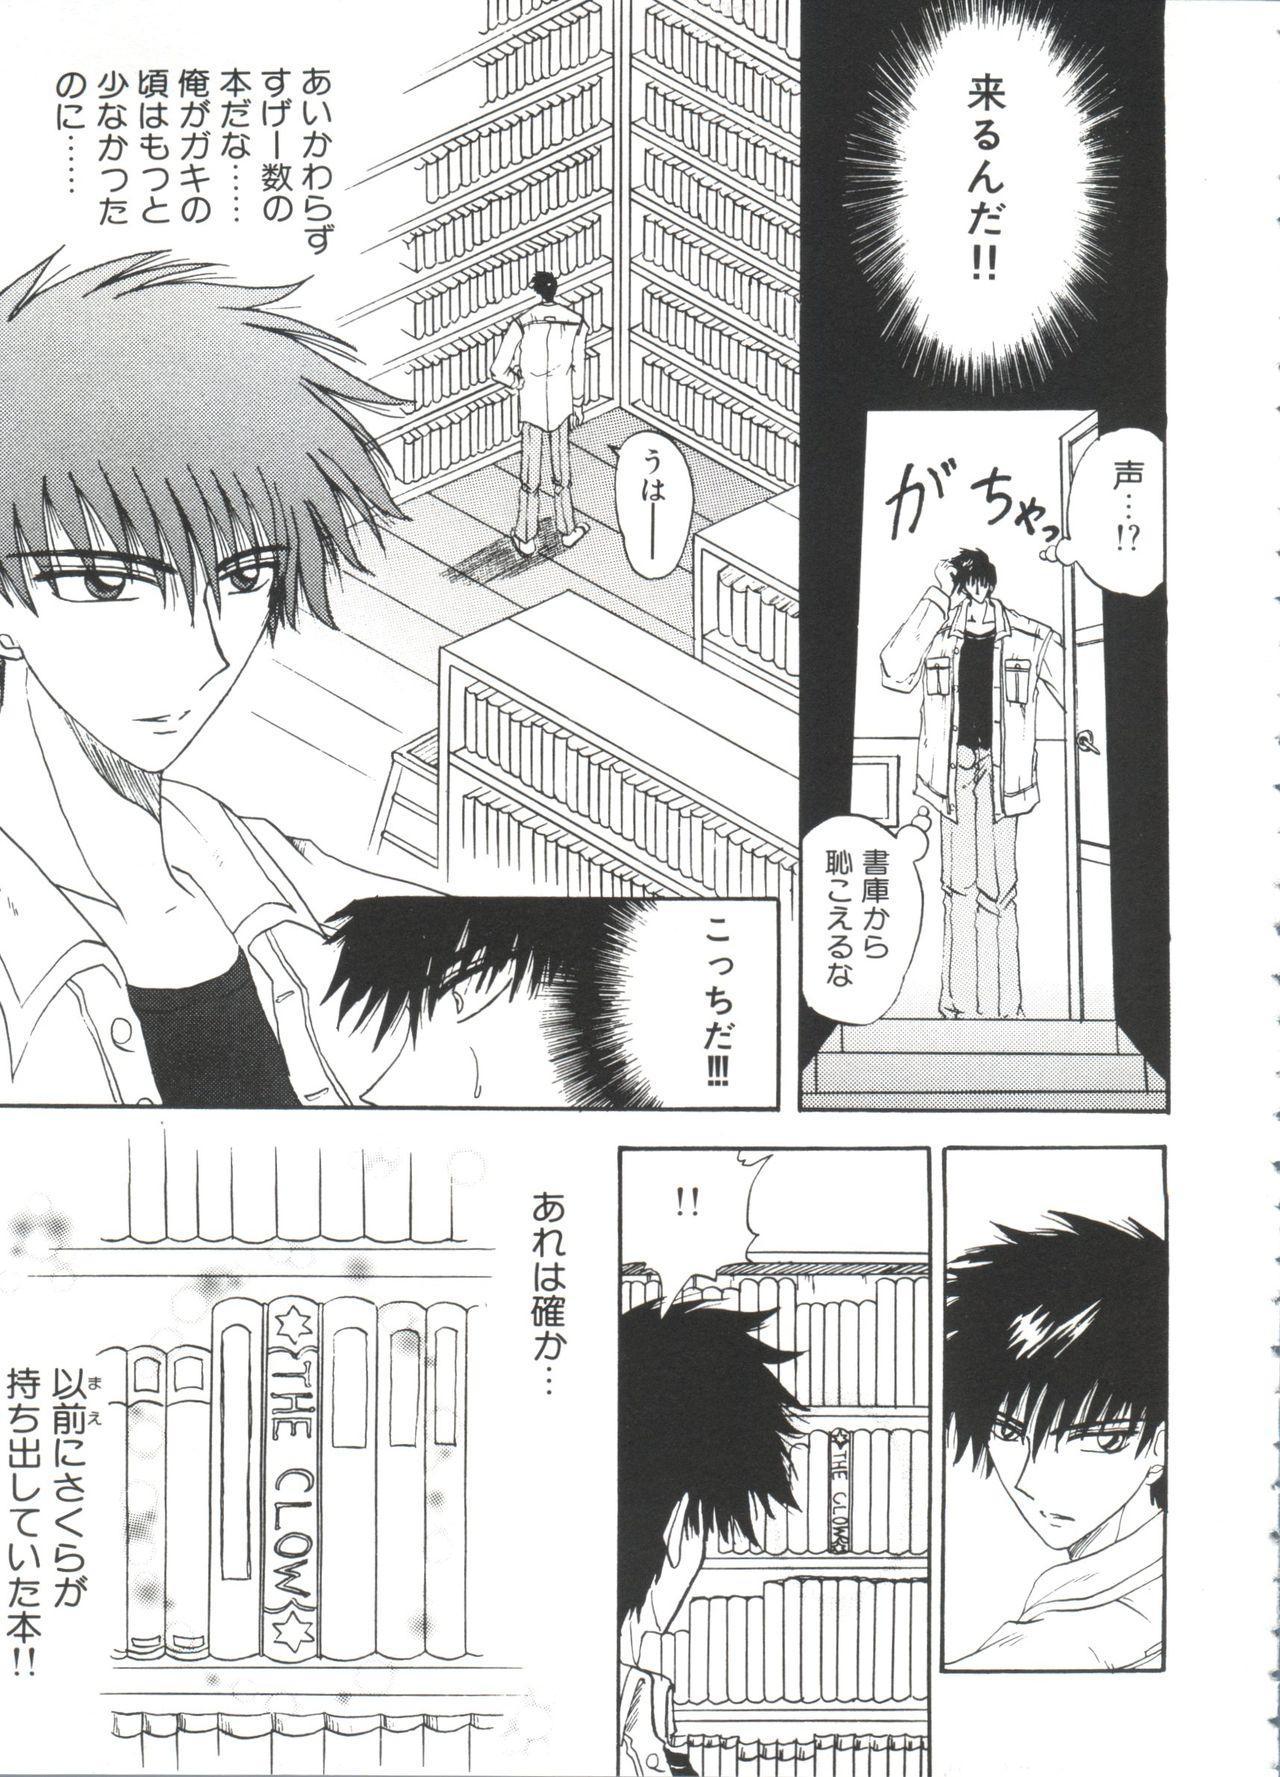 Ero-chan to Issho 2 98